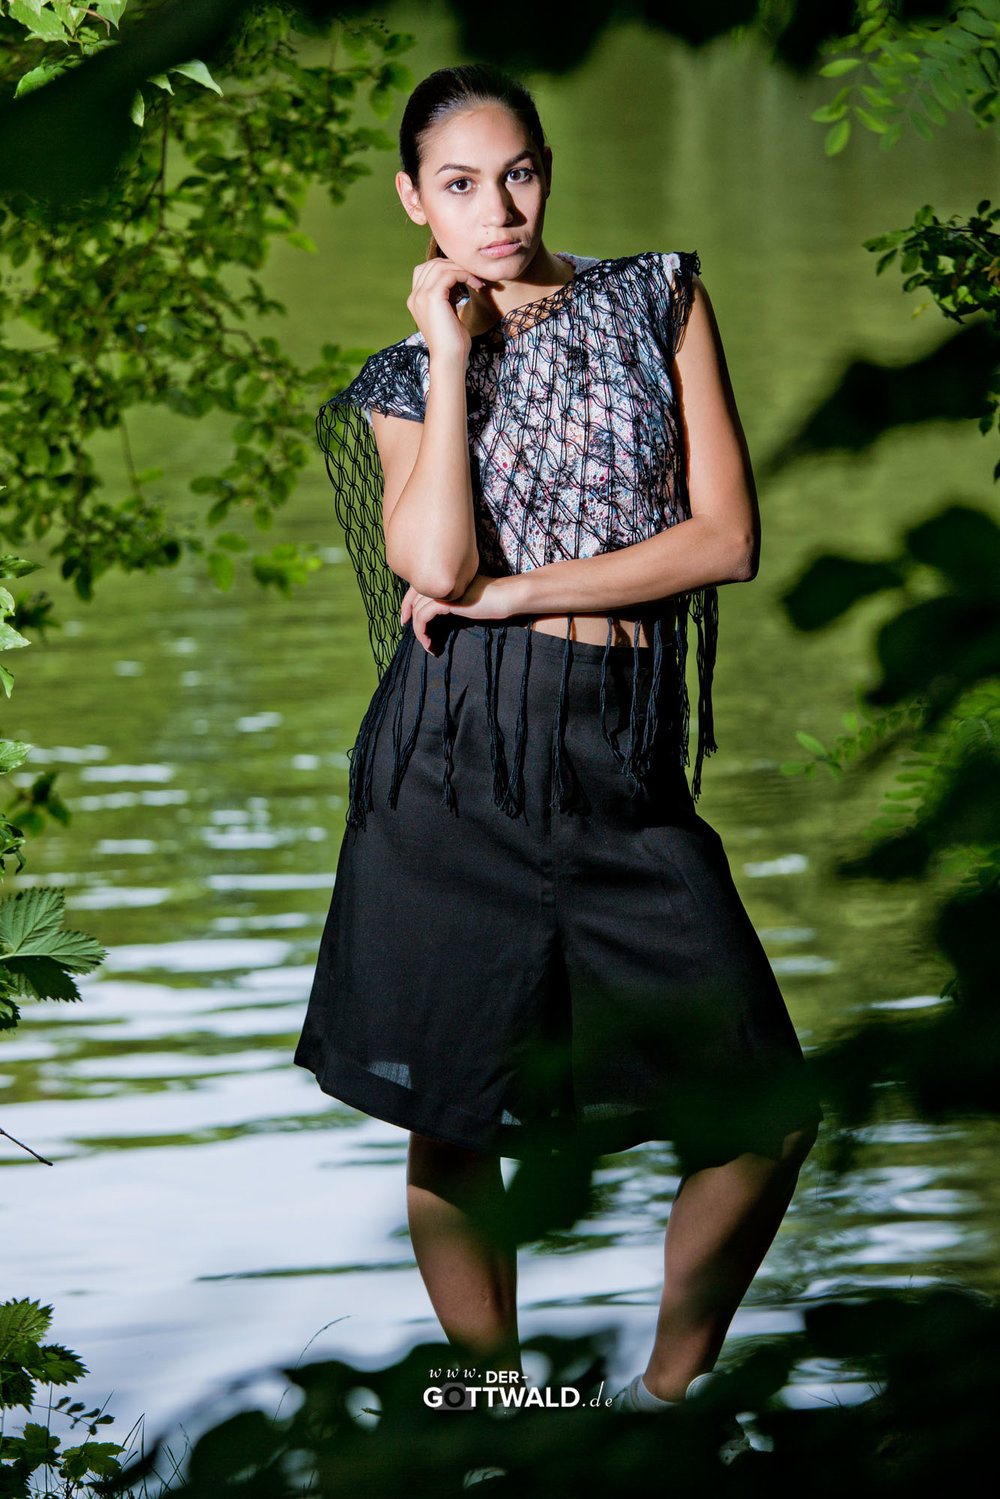 der-gottwaldDE - Fashion 05.jpg